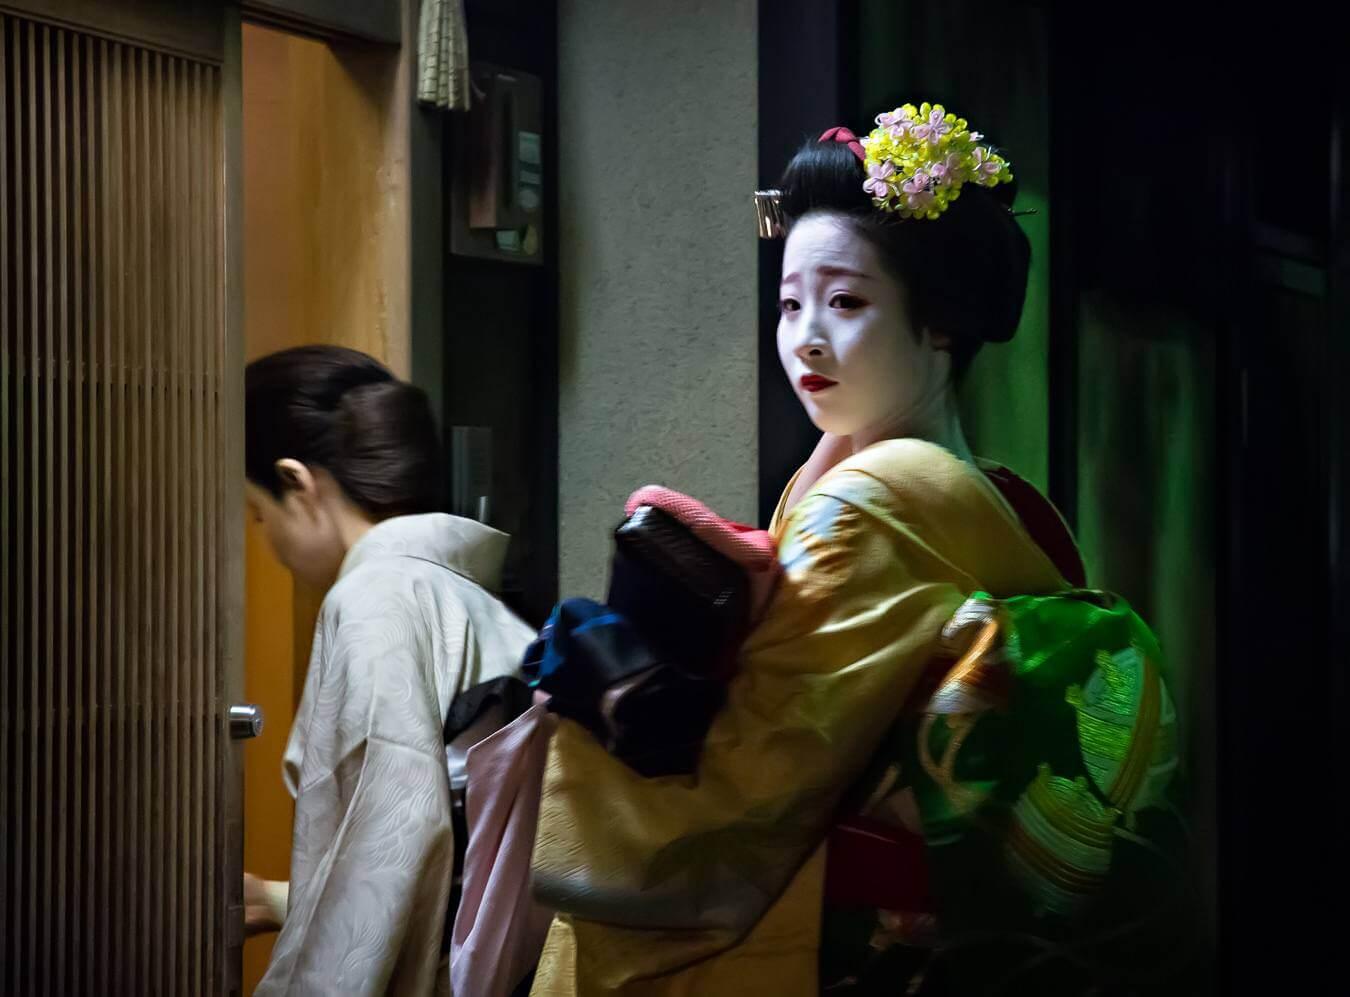 Maiko Geisha entering a Teahouse, Kyoto - Photo by Zed Sindelar of CuriousZed Photography